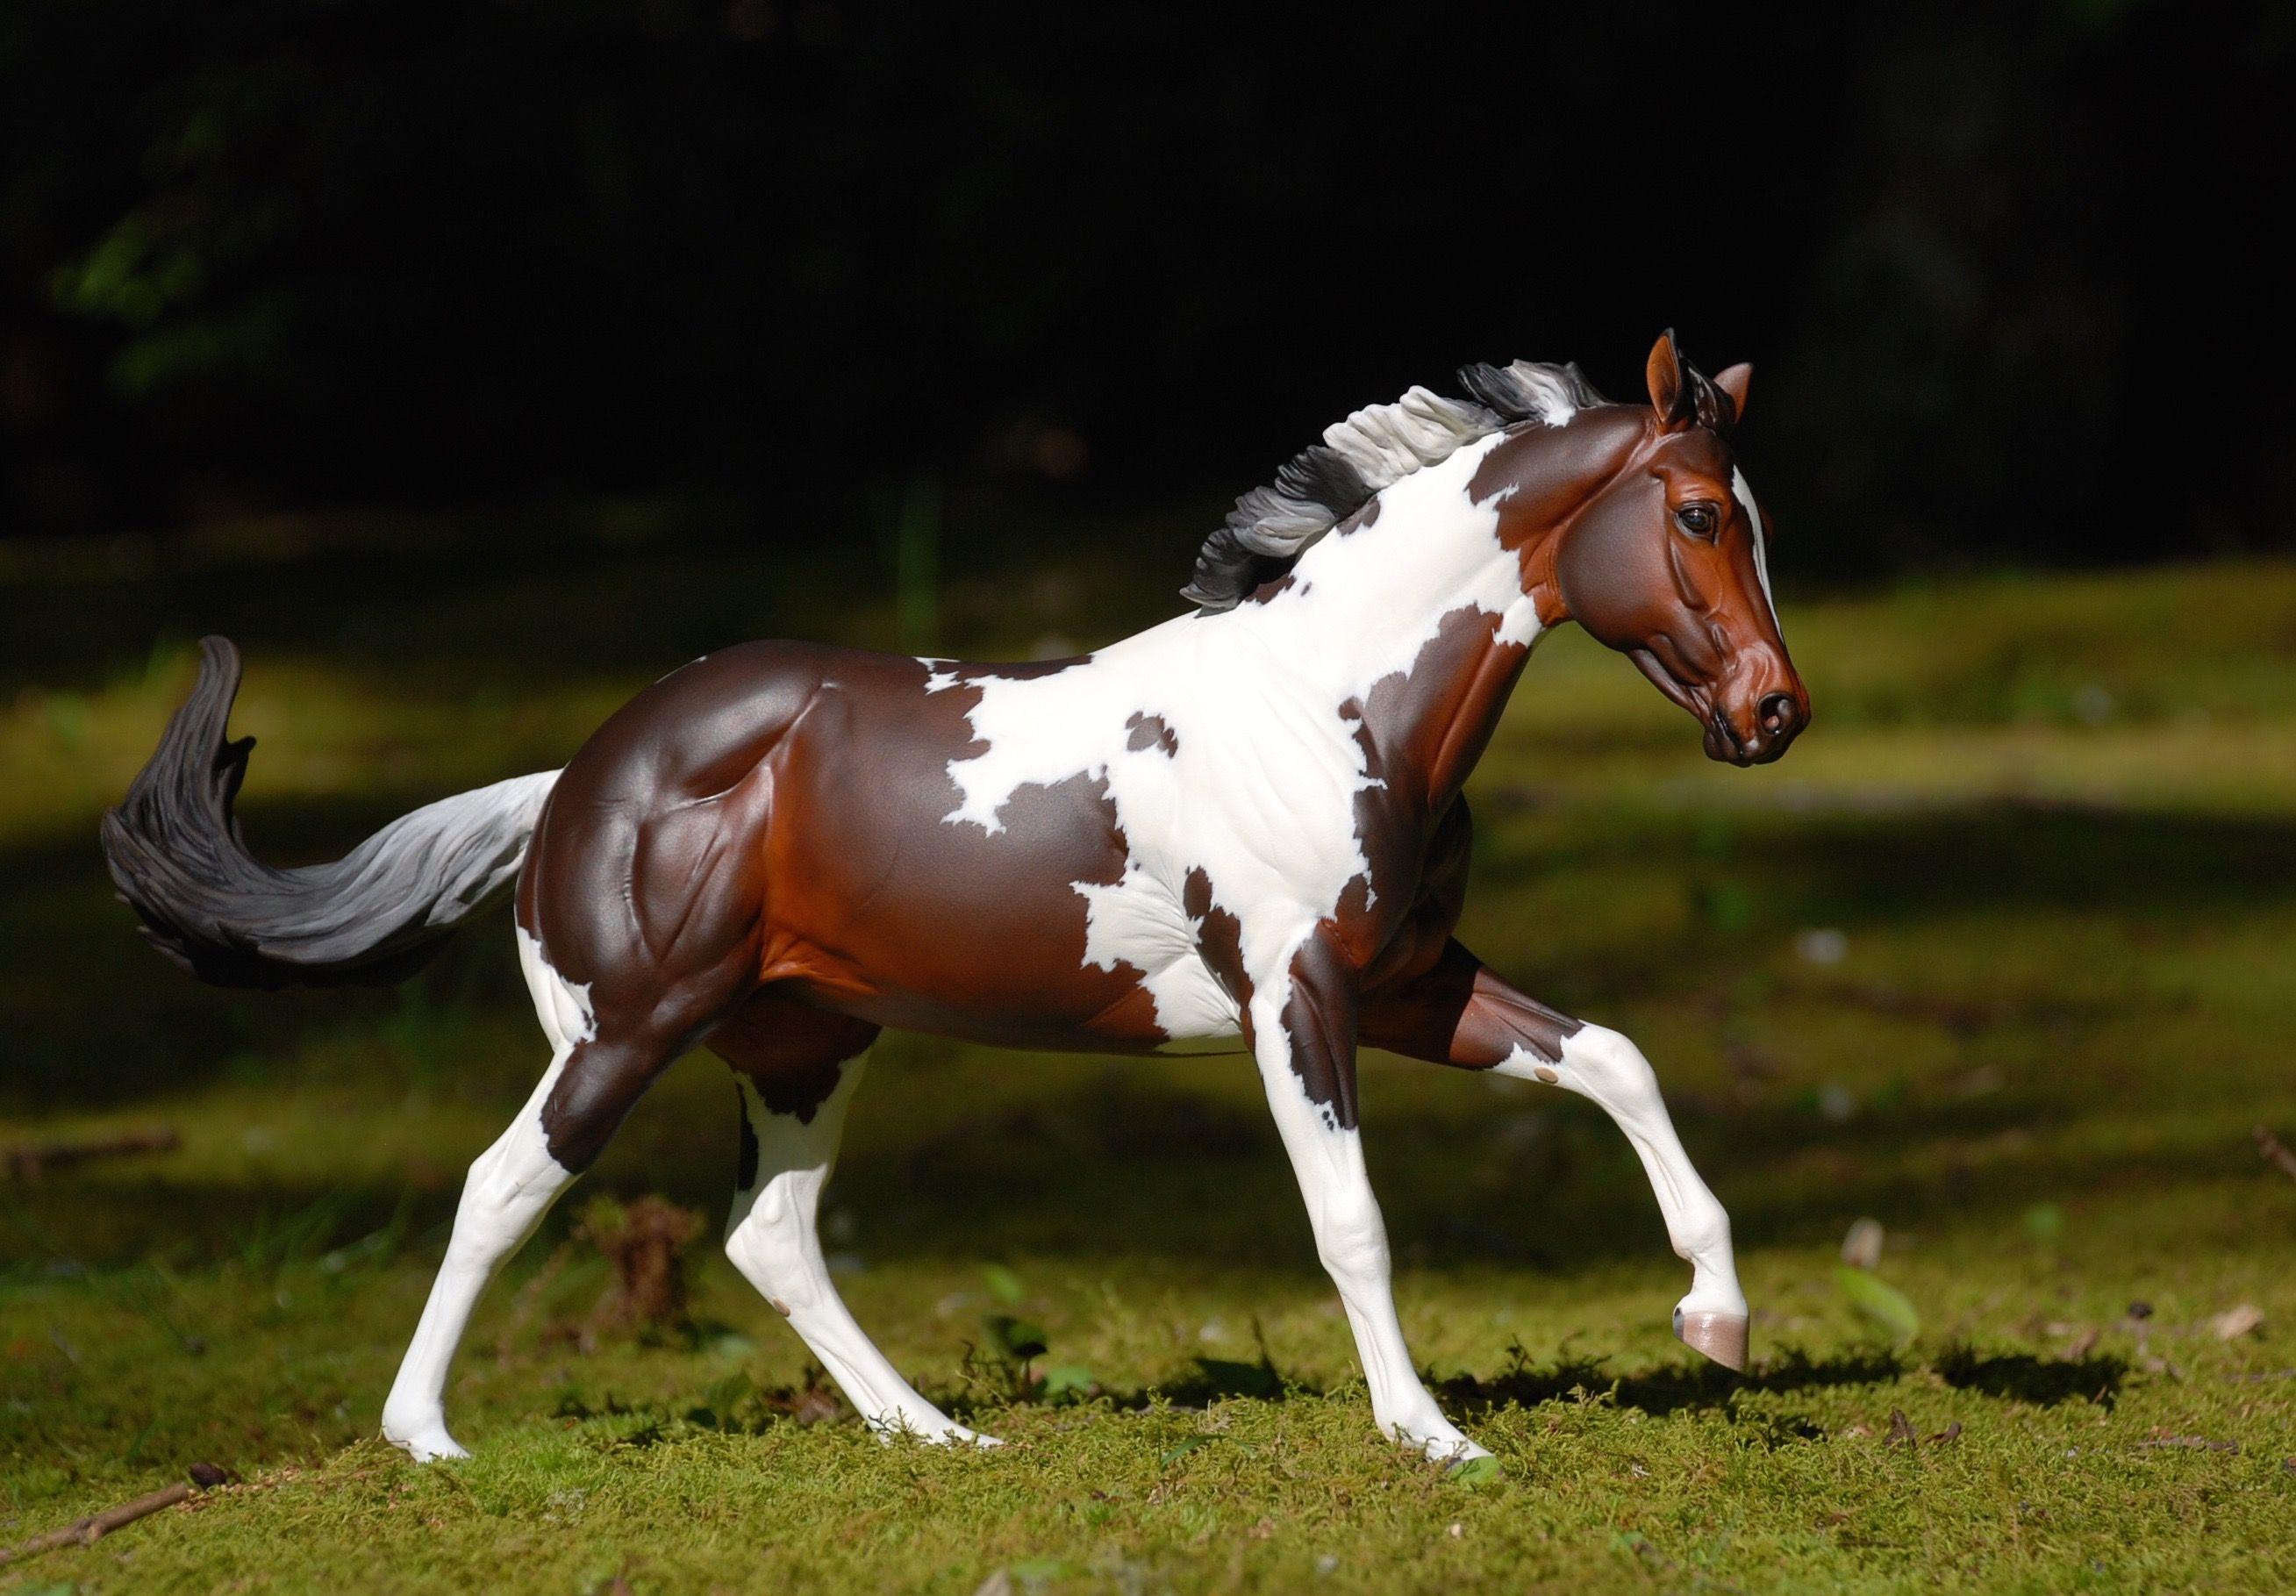 картинки лошадей брейер на природе доставкой тамбов